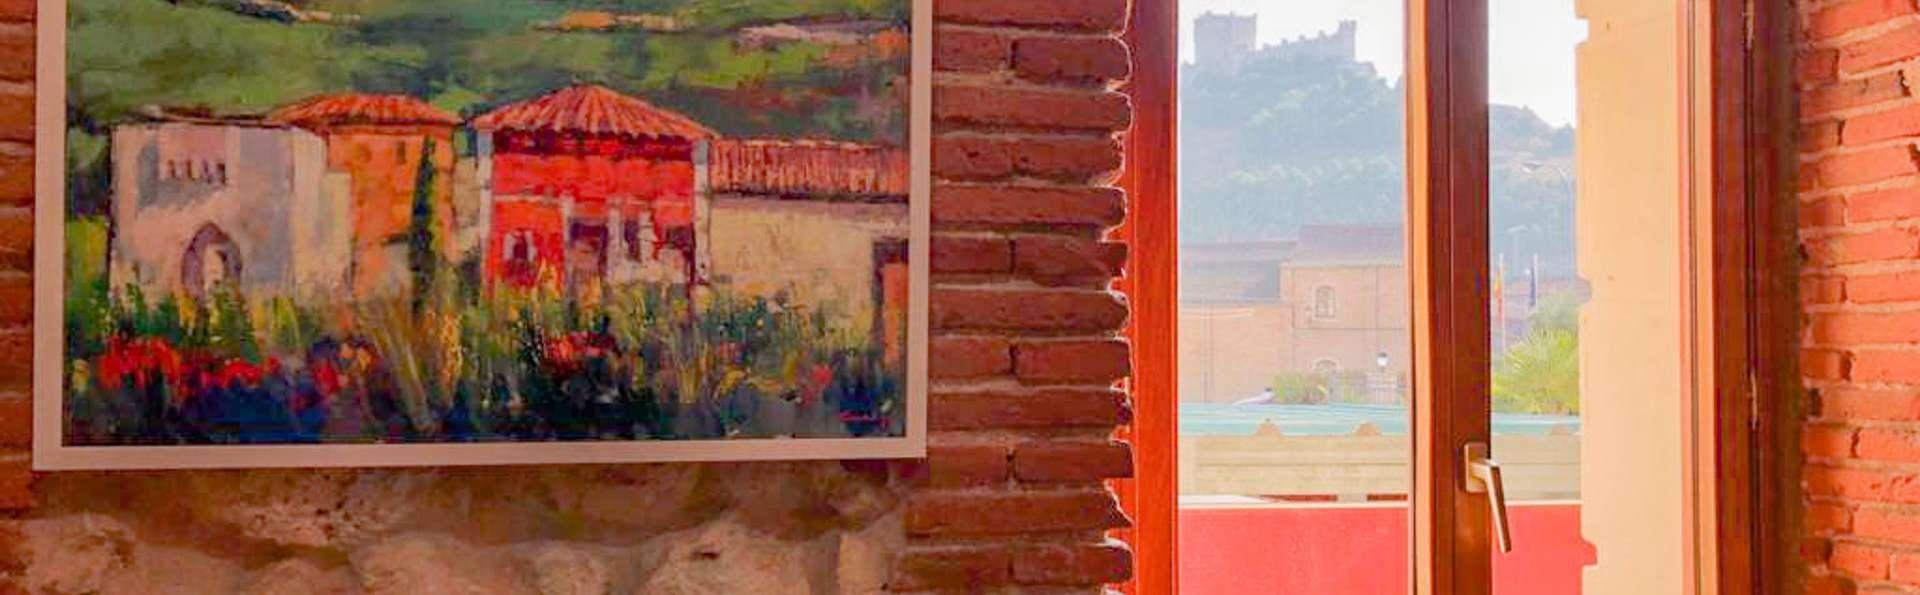 Hotel AM RIbera del Duero - EDIT_DETAIL_01.jpg